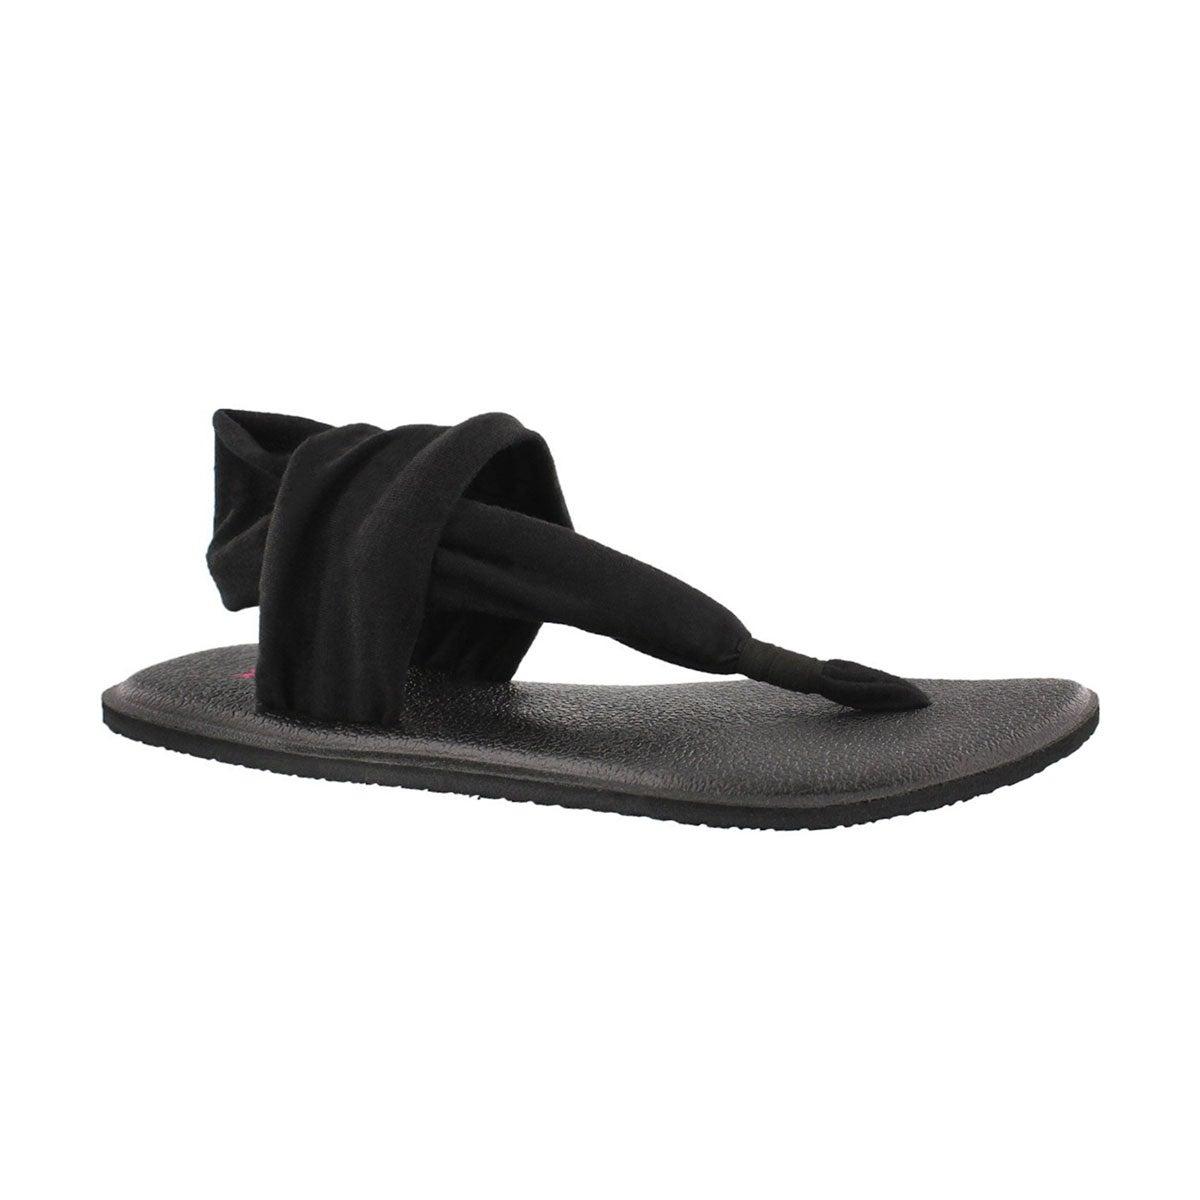 Girls' YOGA SLING BURST black thong sandals